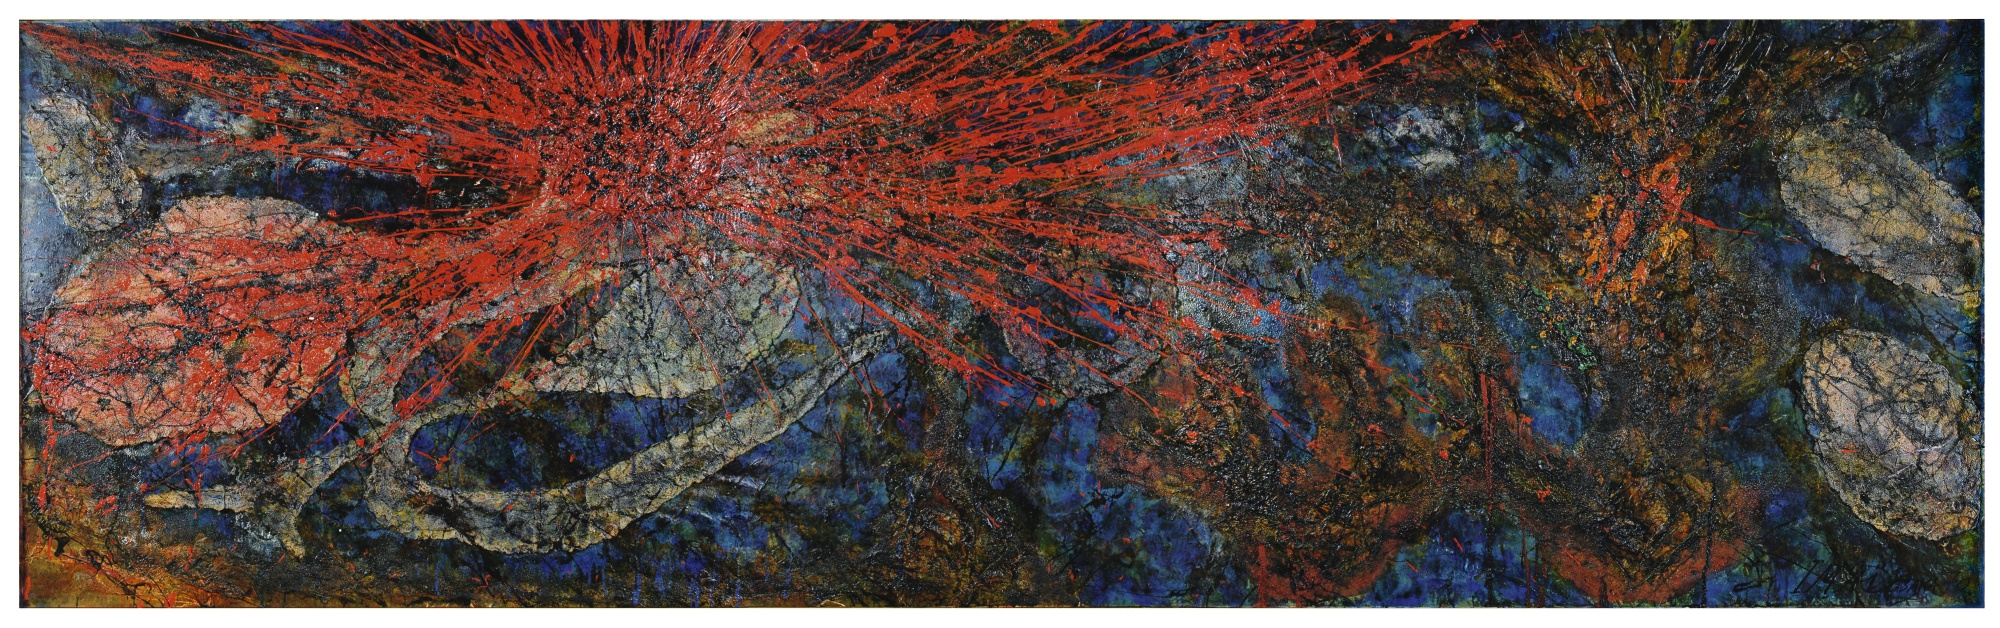 Toshimitsu Imai-Light Of The Orient-1970